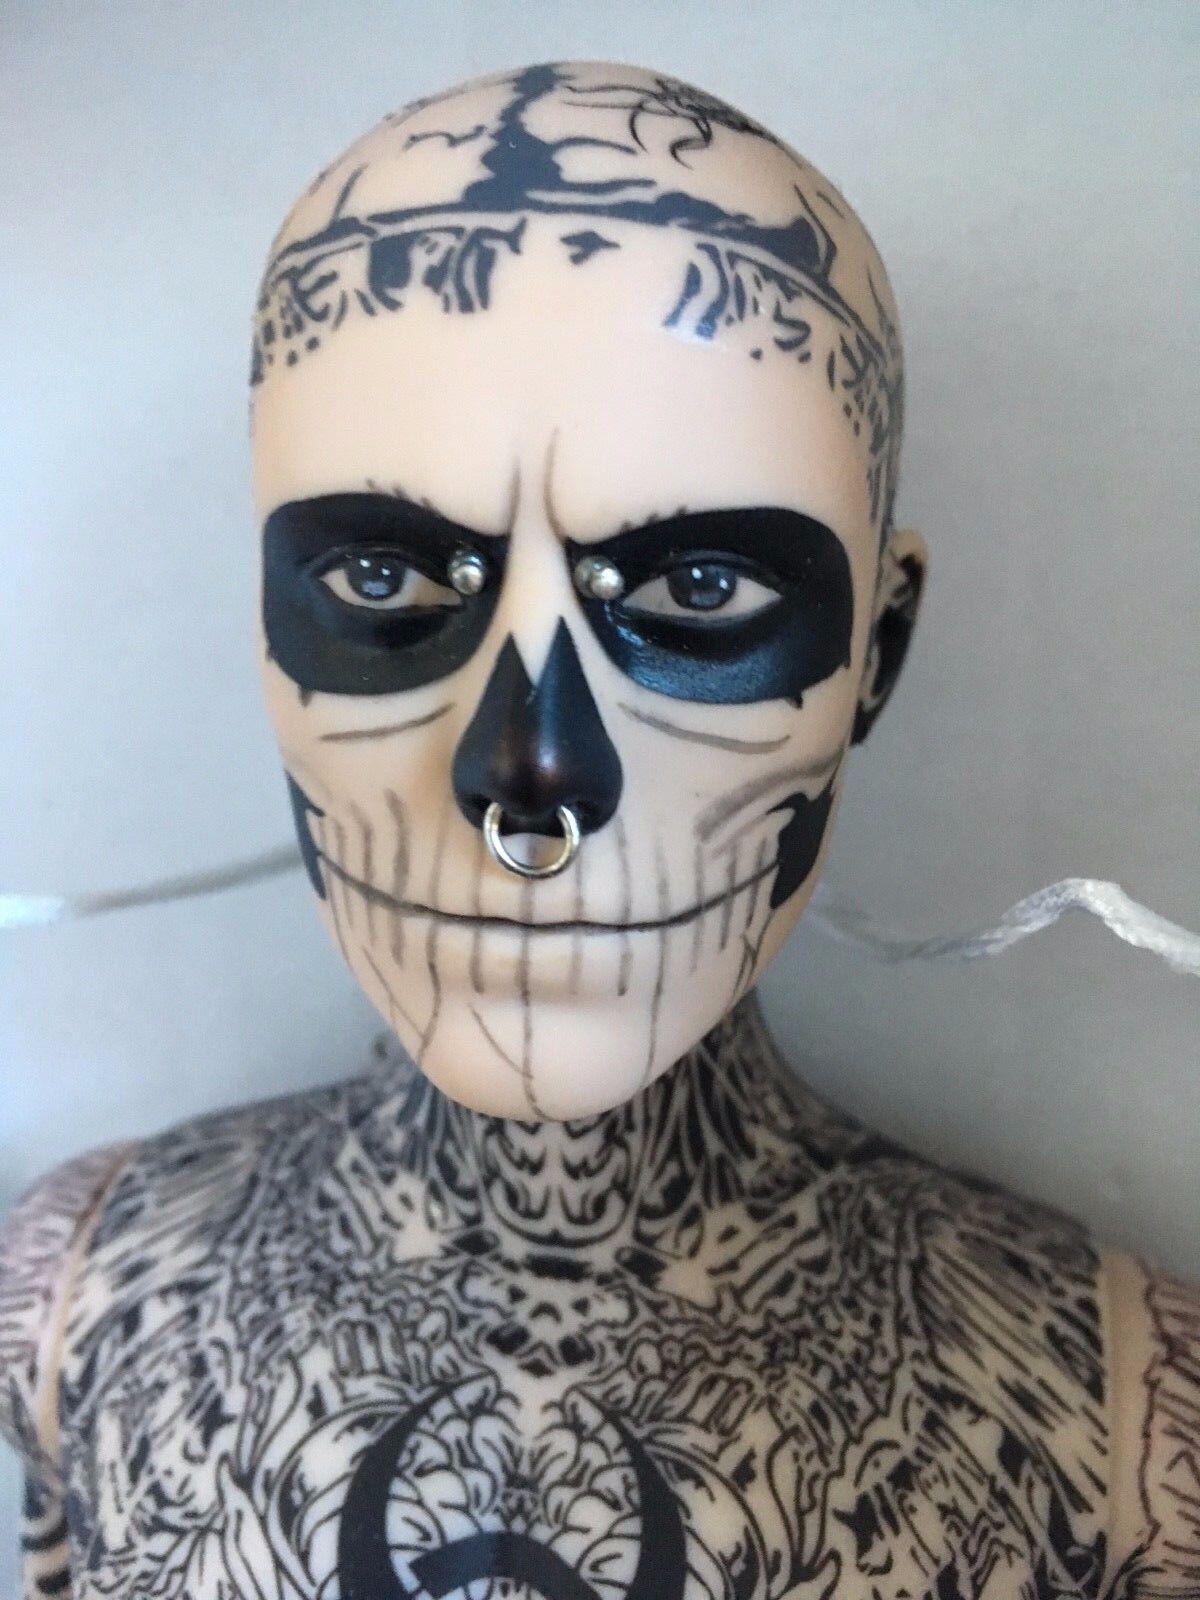 Exclusivo Rico Zombie Boy 17  Vinilo tatuado Figura Muñeco por Tonner LE500 con cajas